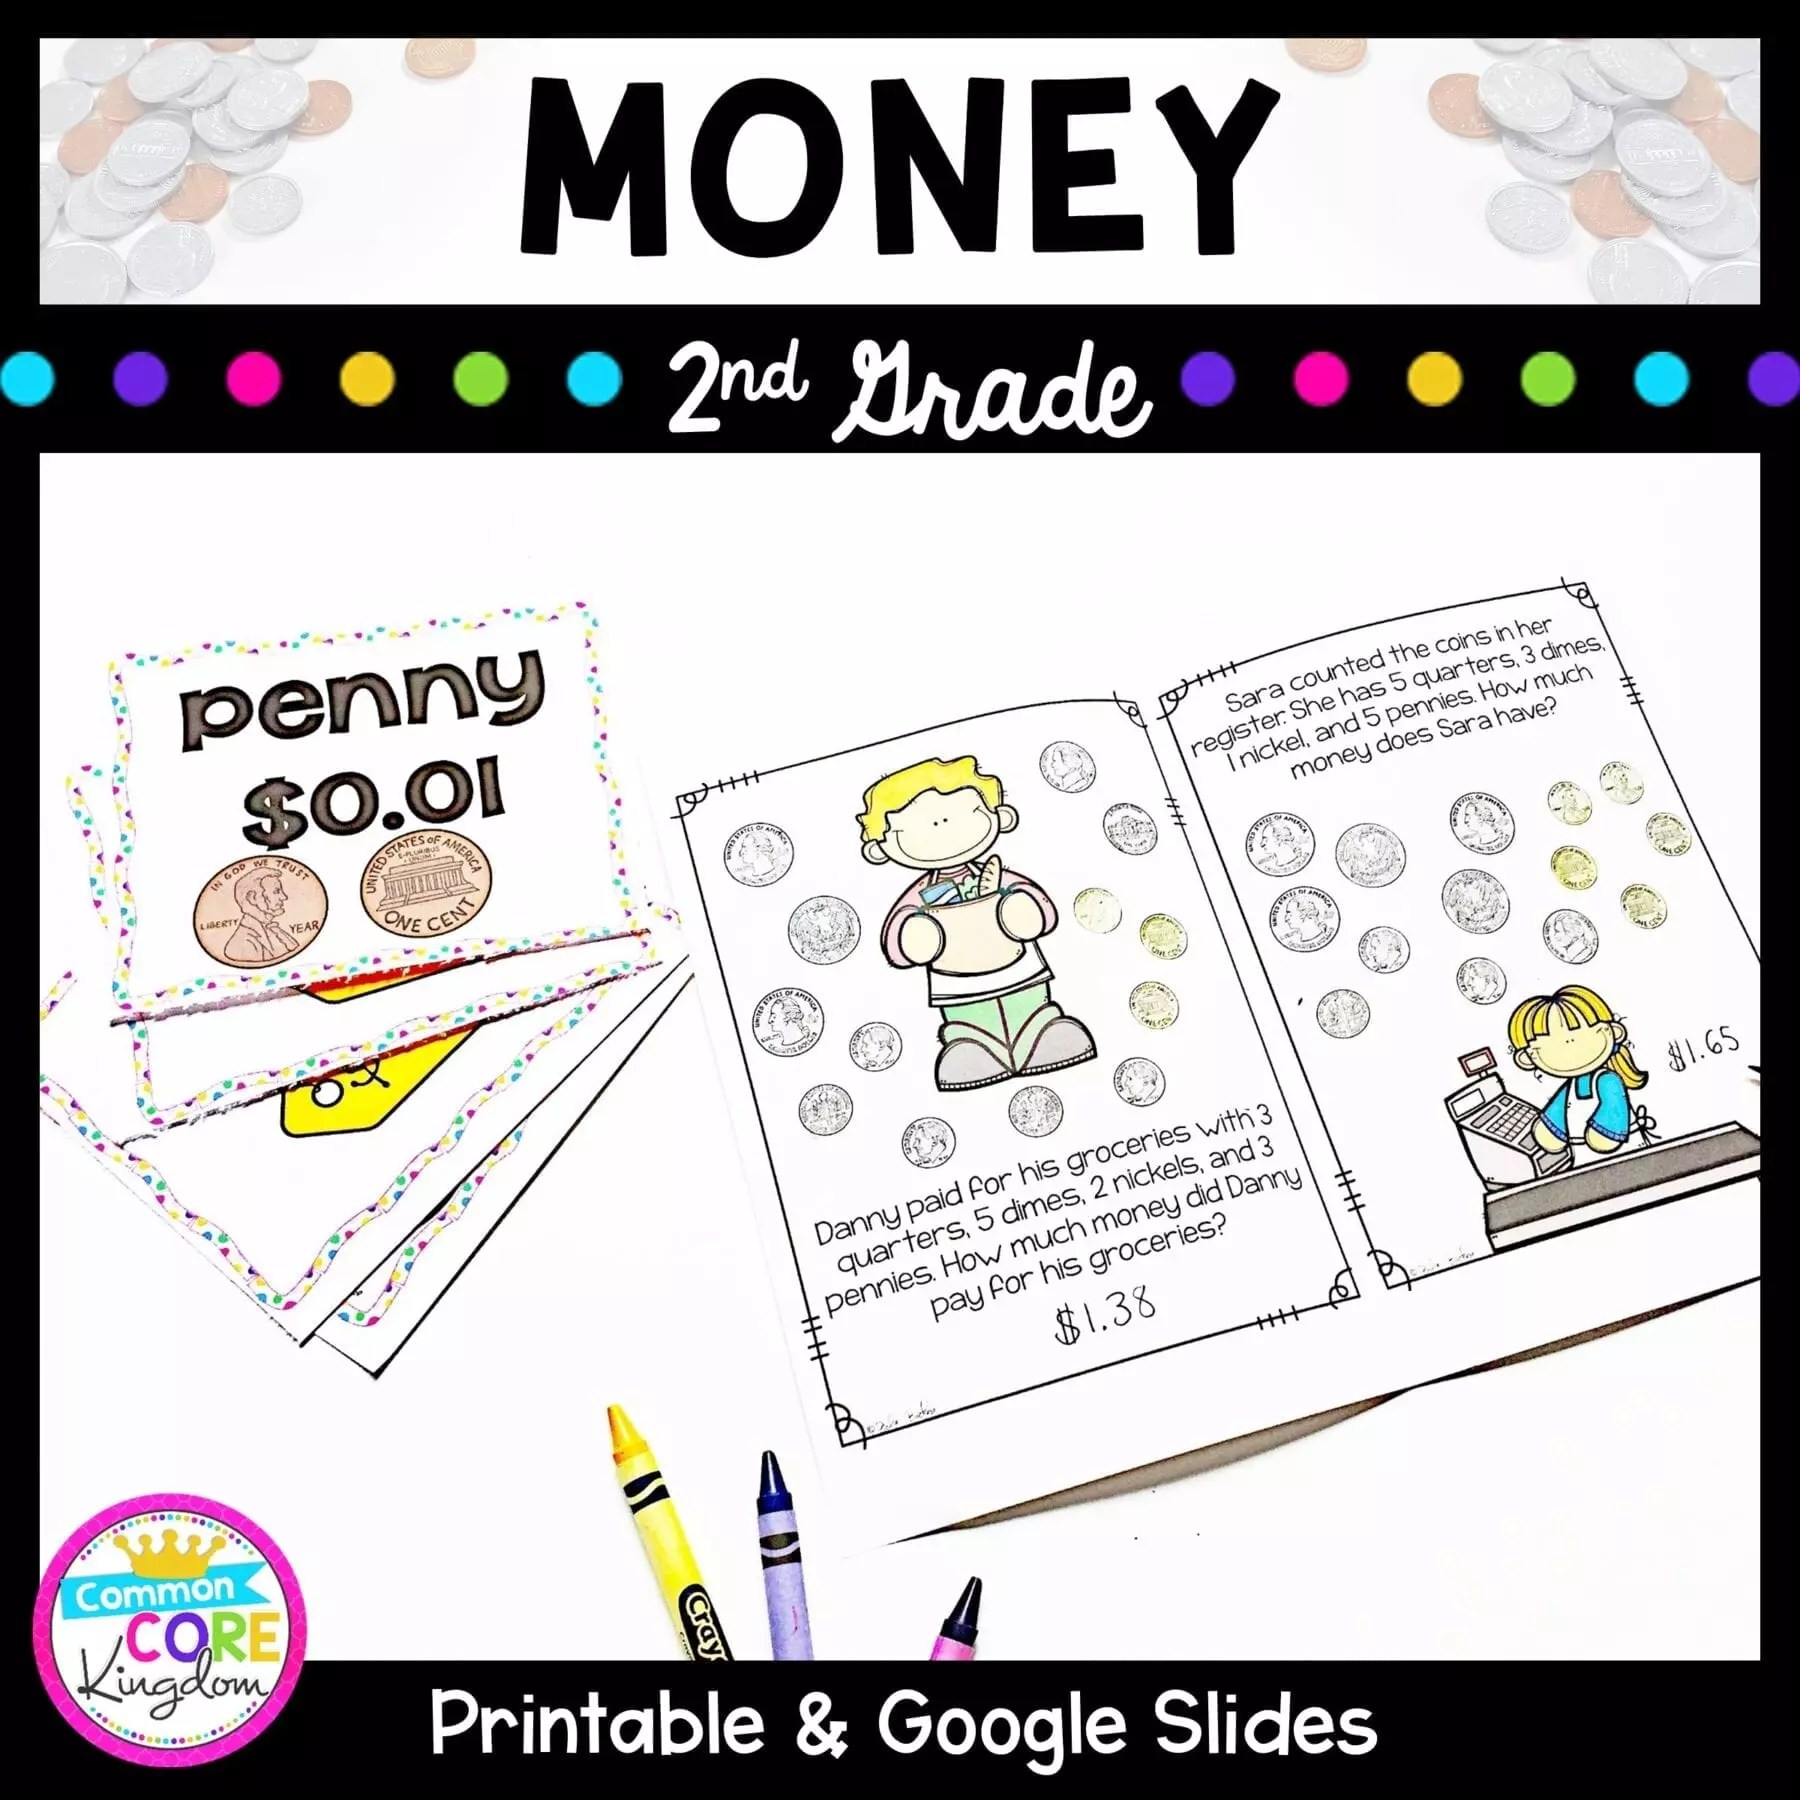 medium resolution of Money - 2nd Grade Math 2.MD.C.8 - Google Slides Distance Learning Pack    Common Core Kingdom   Math Skills